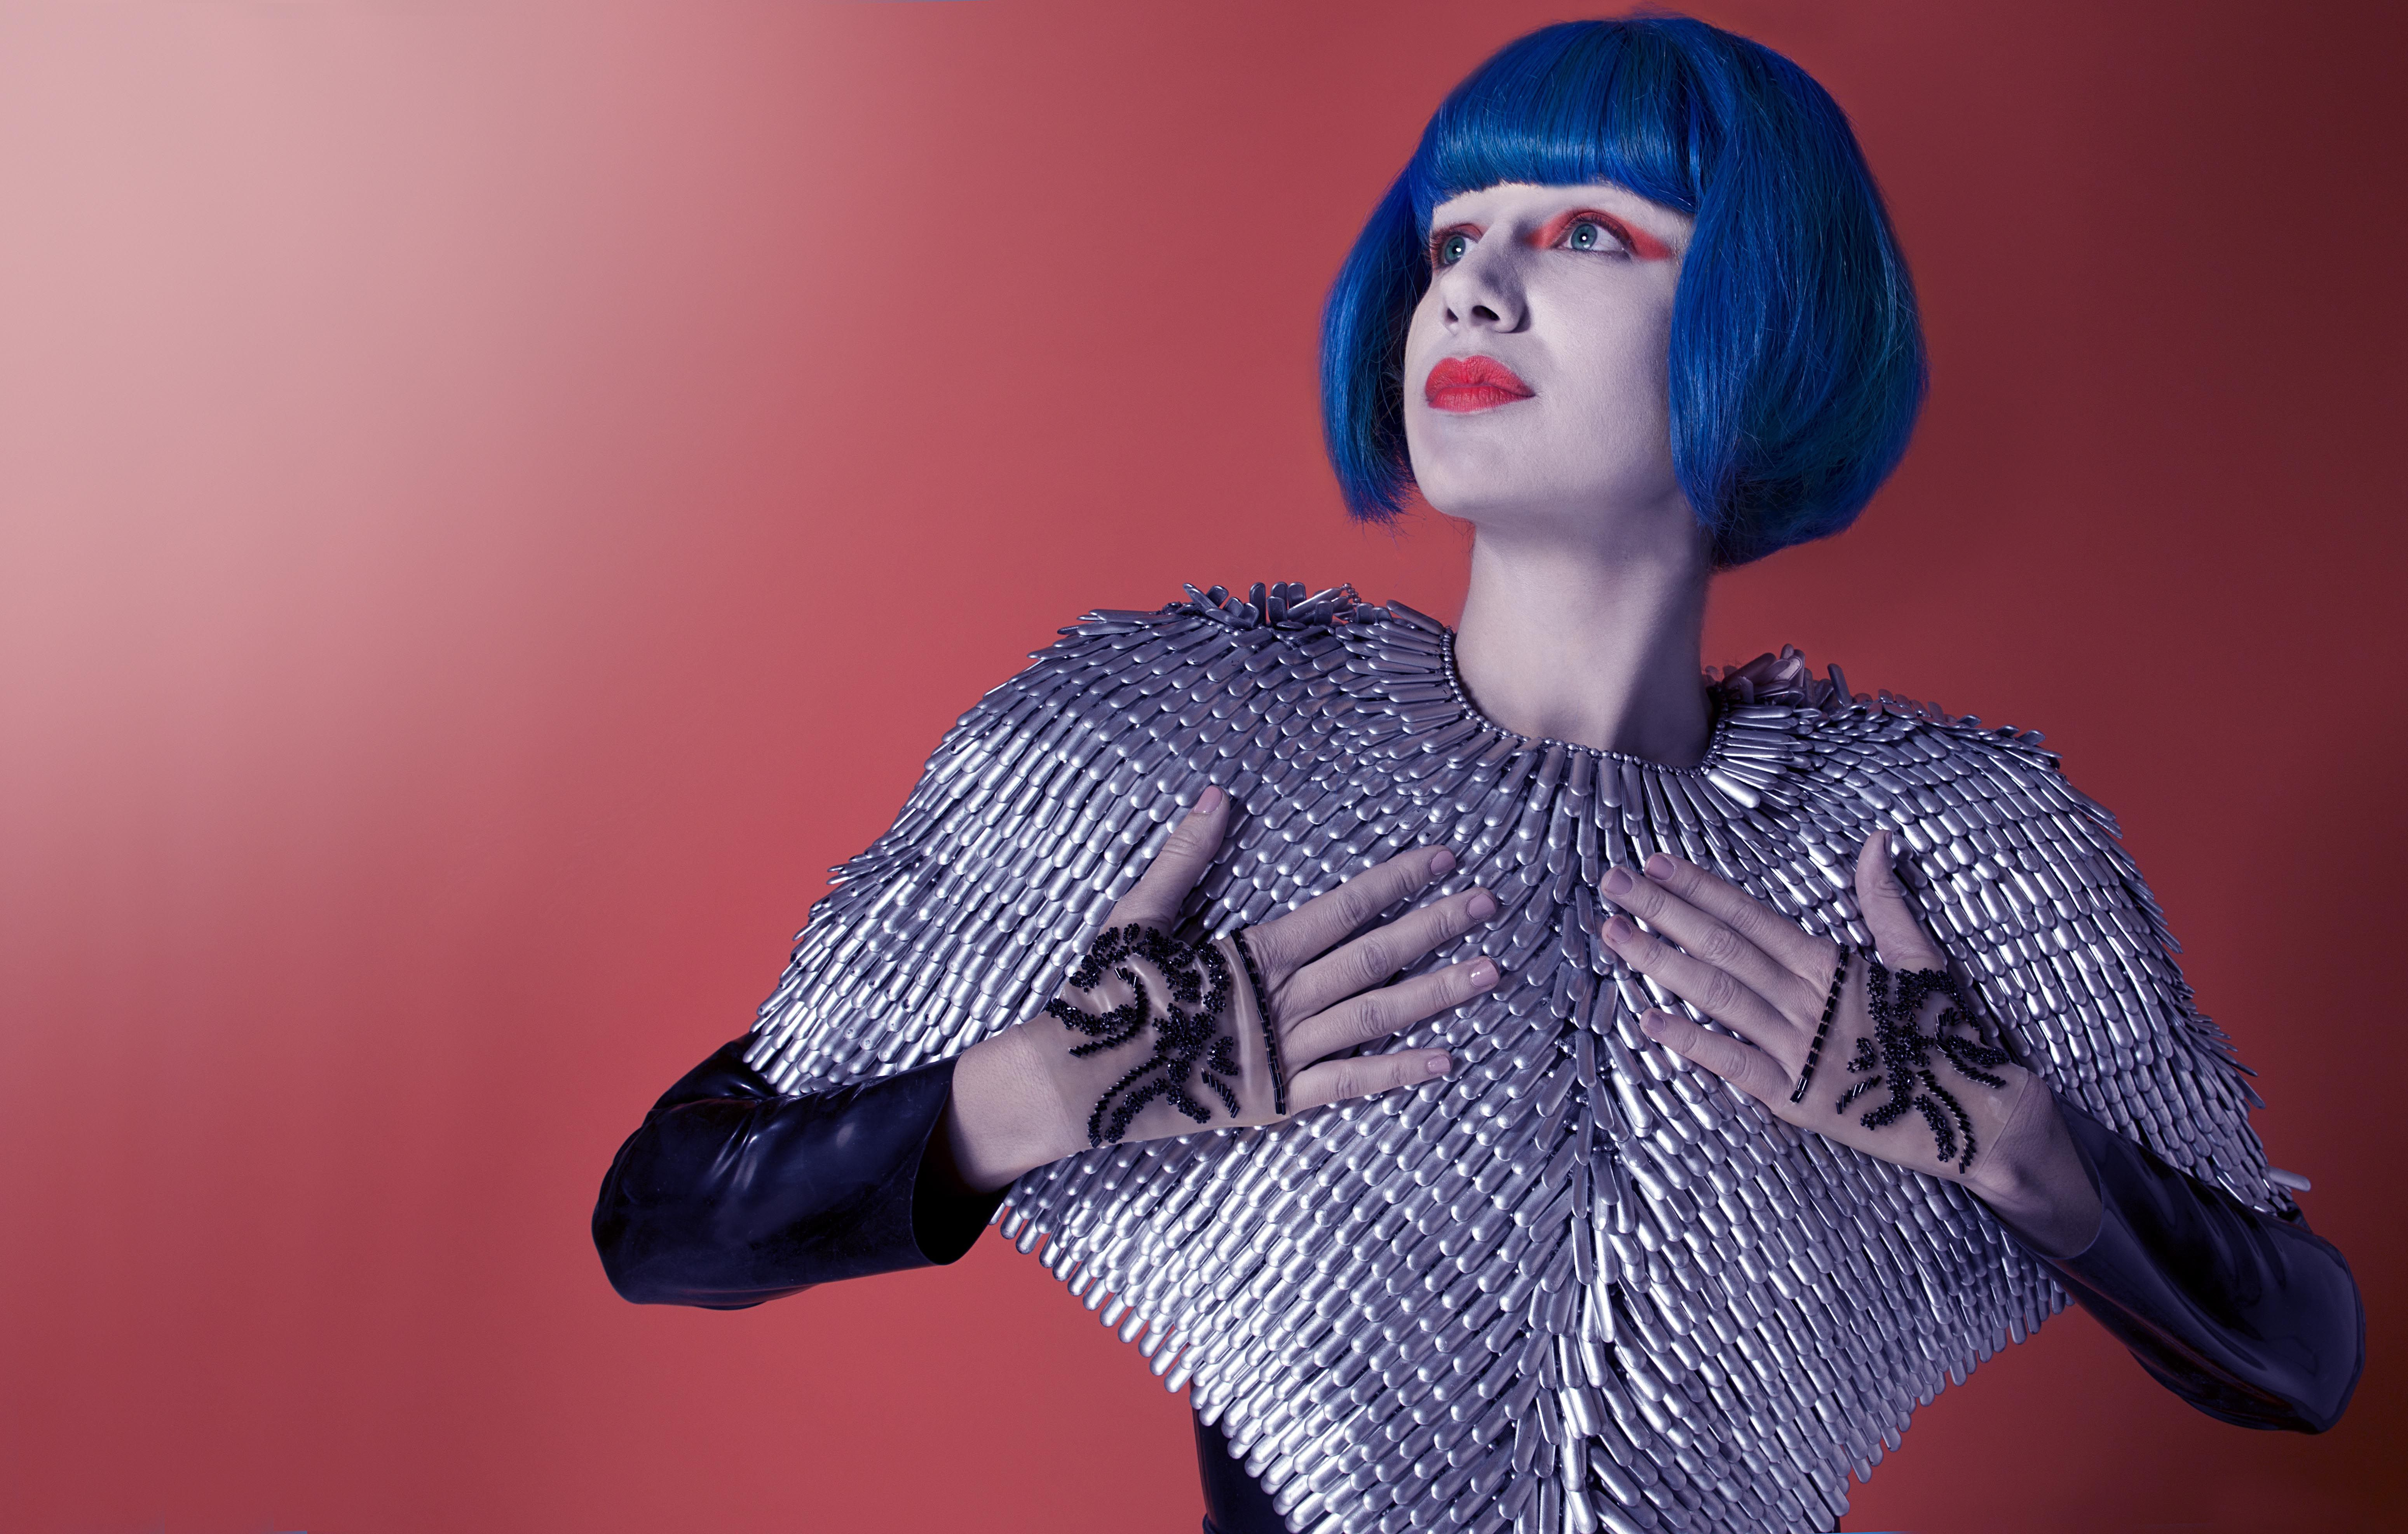 mujer, futurista, maquillaje futurista, pelo azul, maquillaje ...